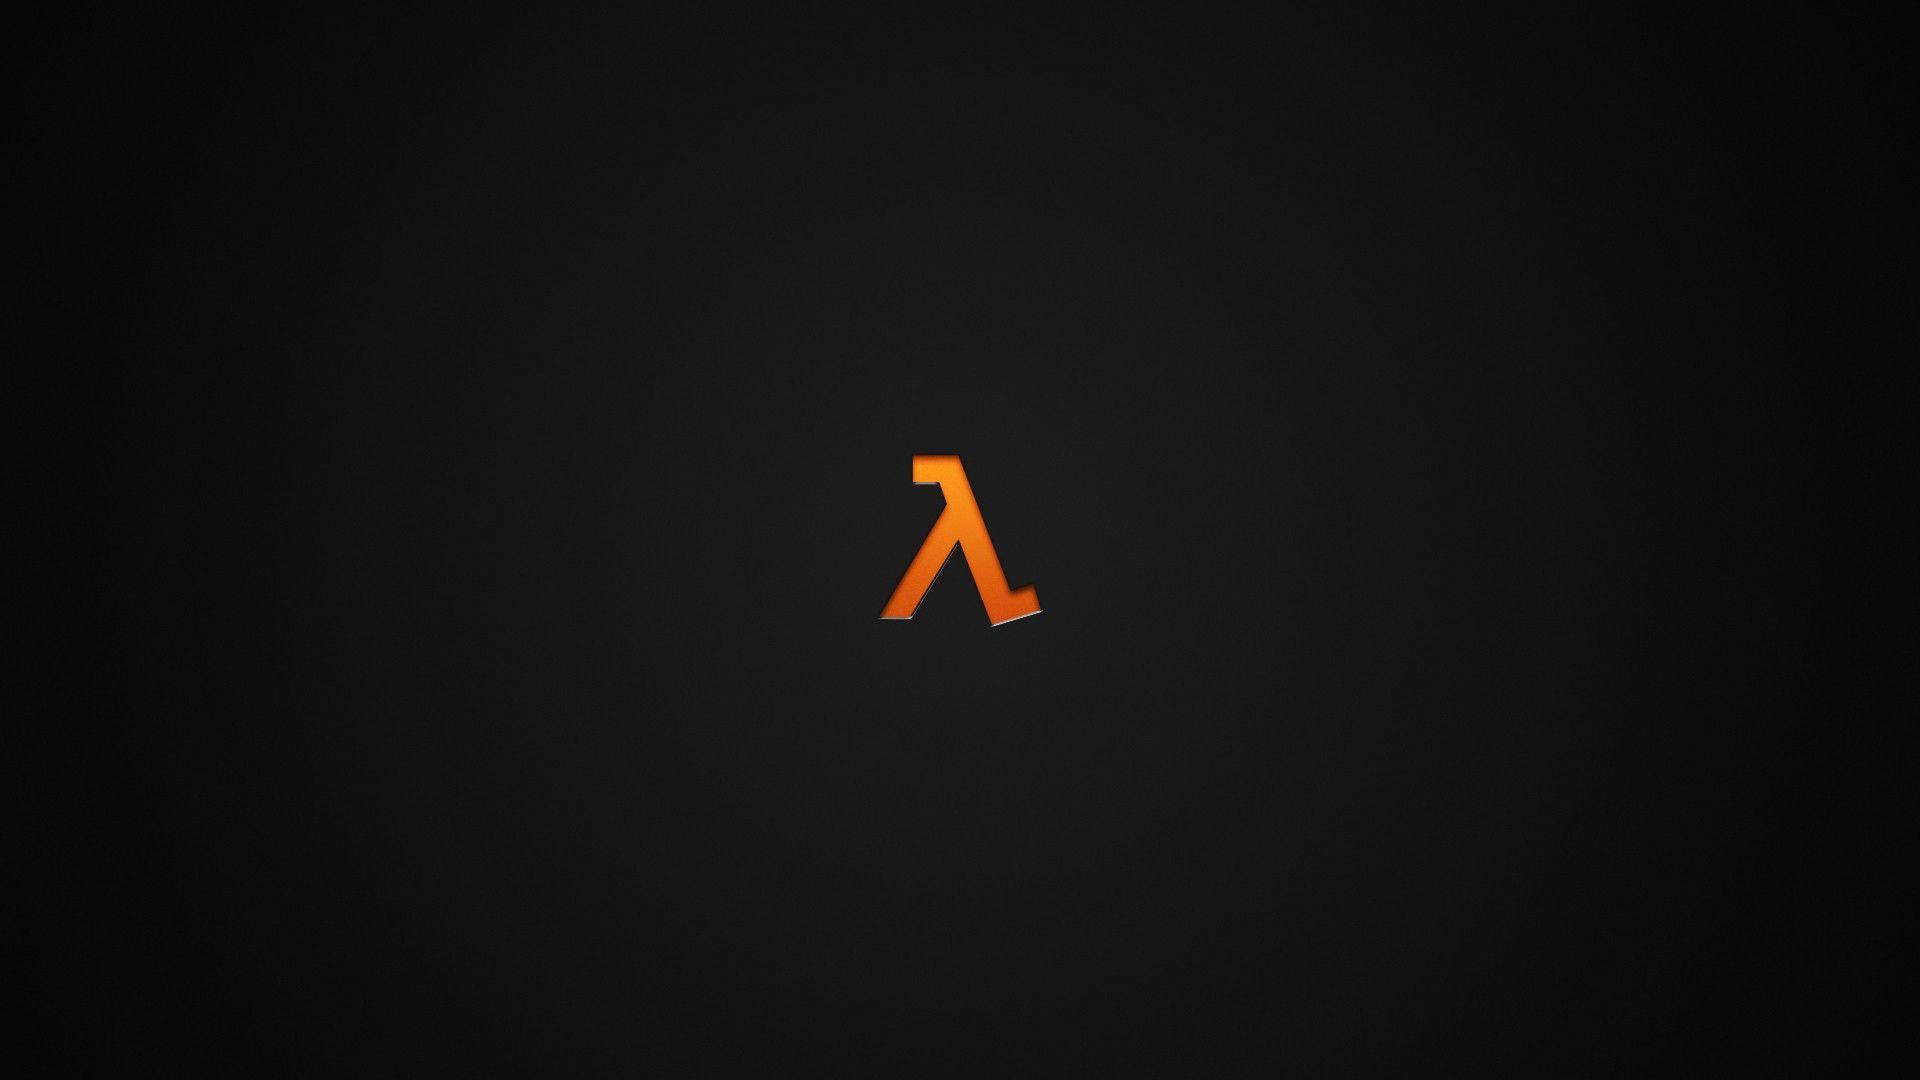 Minimalism Dark Video Games Lambda Orange Half Life Wallpaper Free Background Photos Hd Wallpaper Phone Backgrounds Tumblr